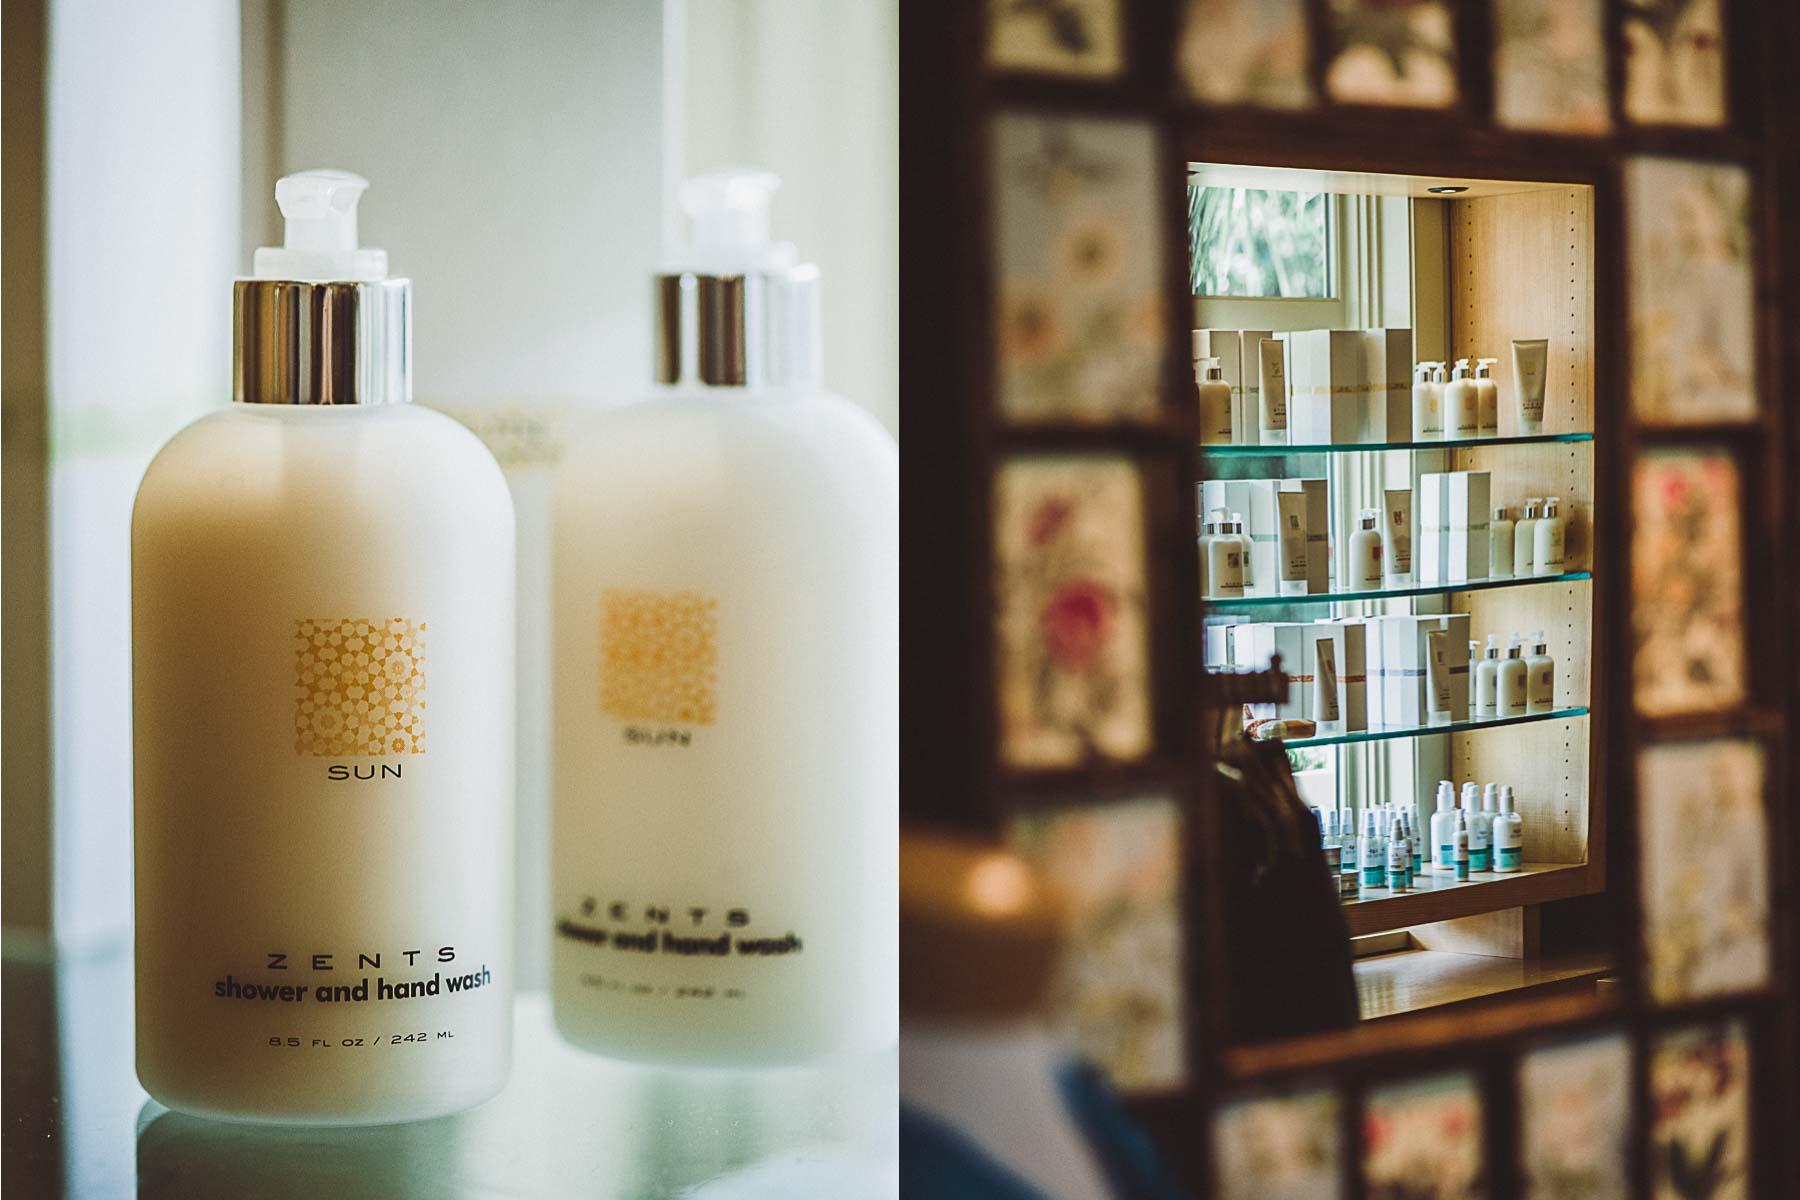 Zents spa products at Omni Amelia Island Resort.